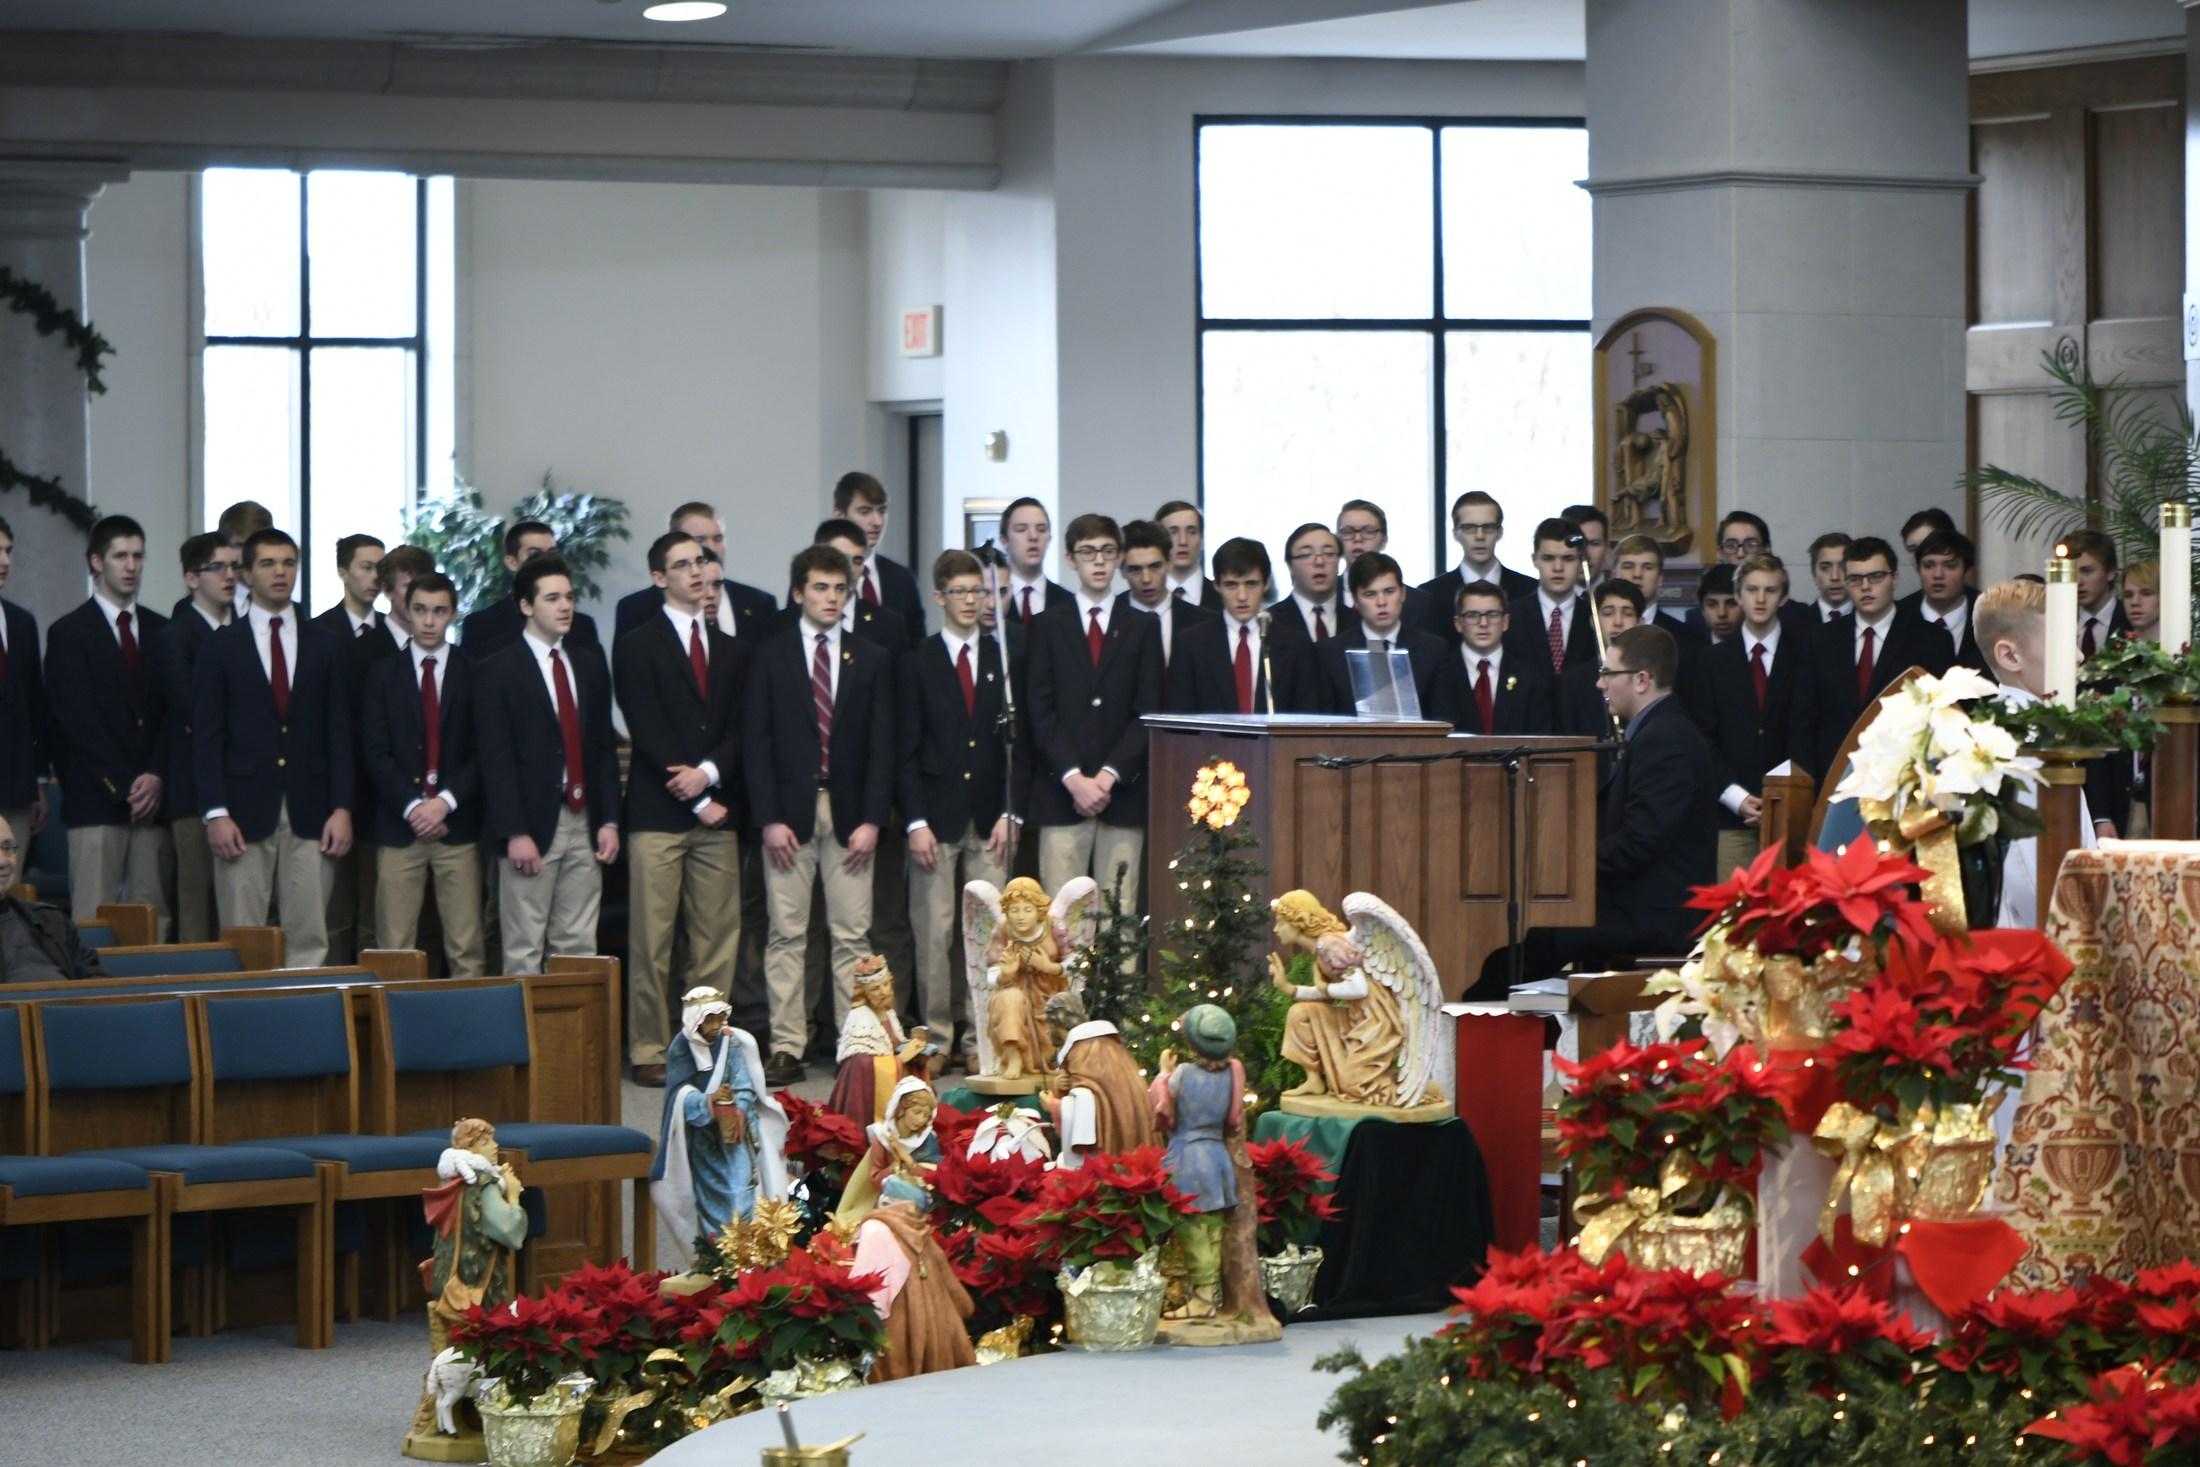 Varsity Singers at St. Stephens